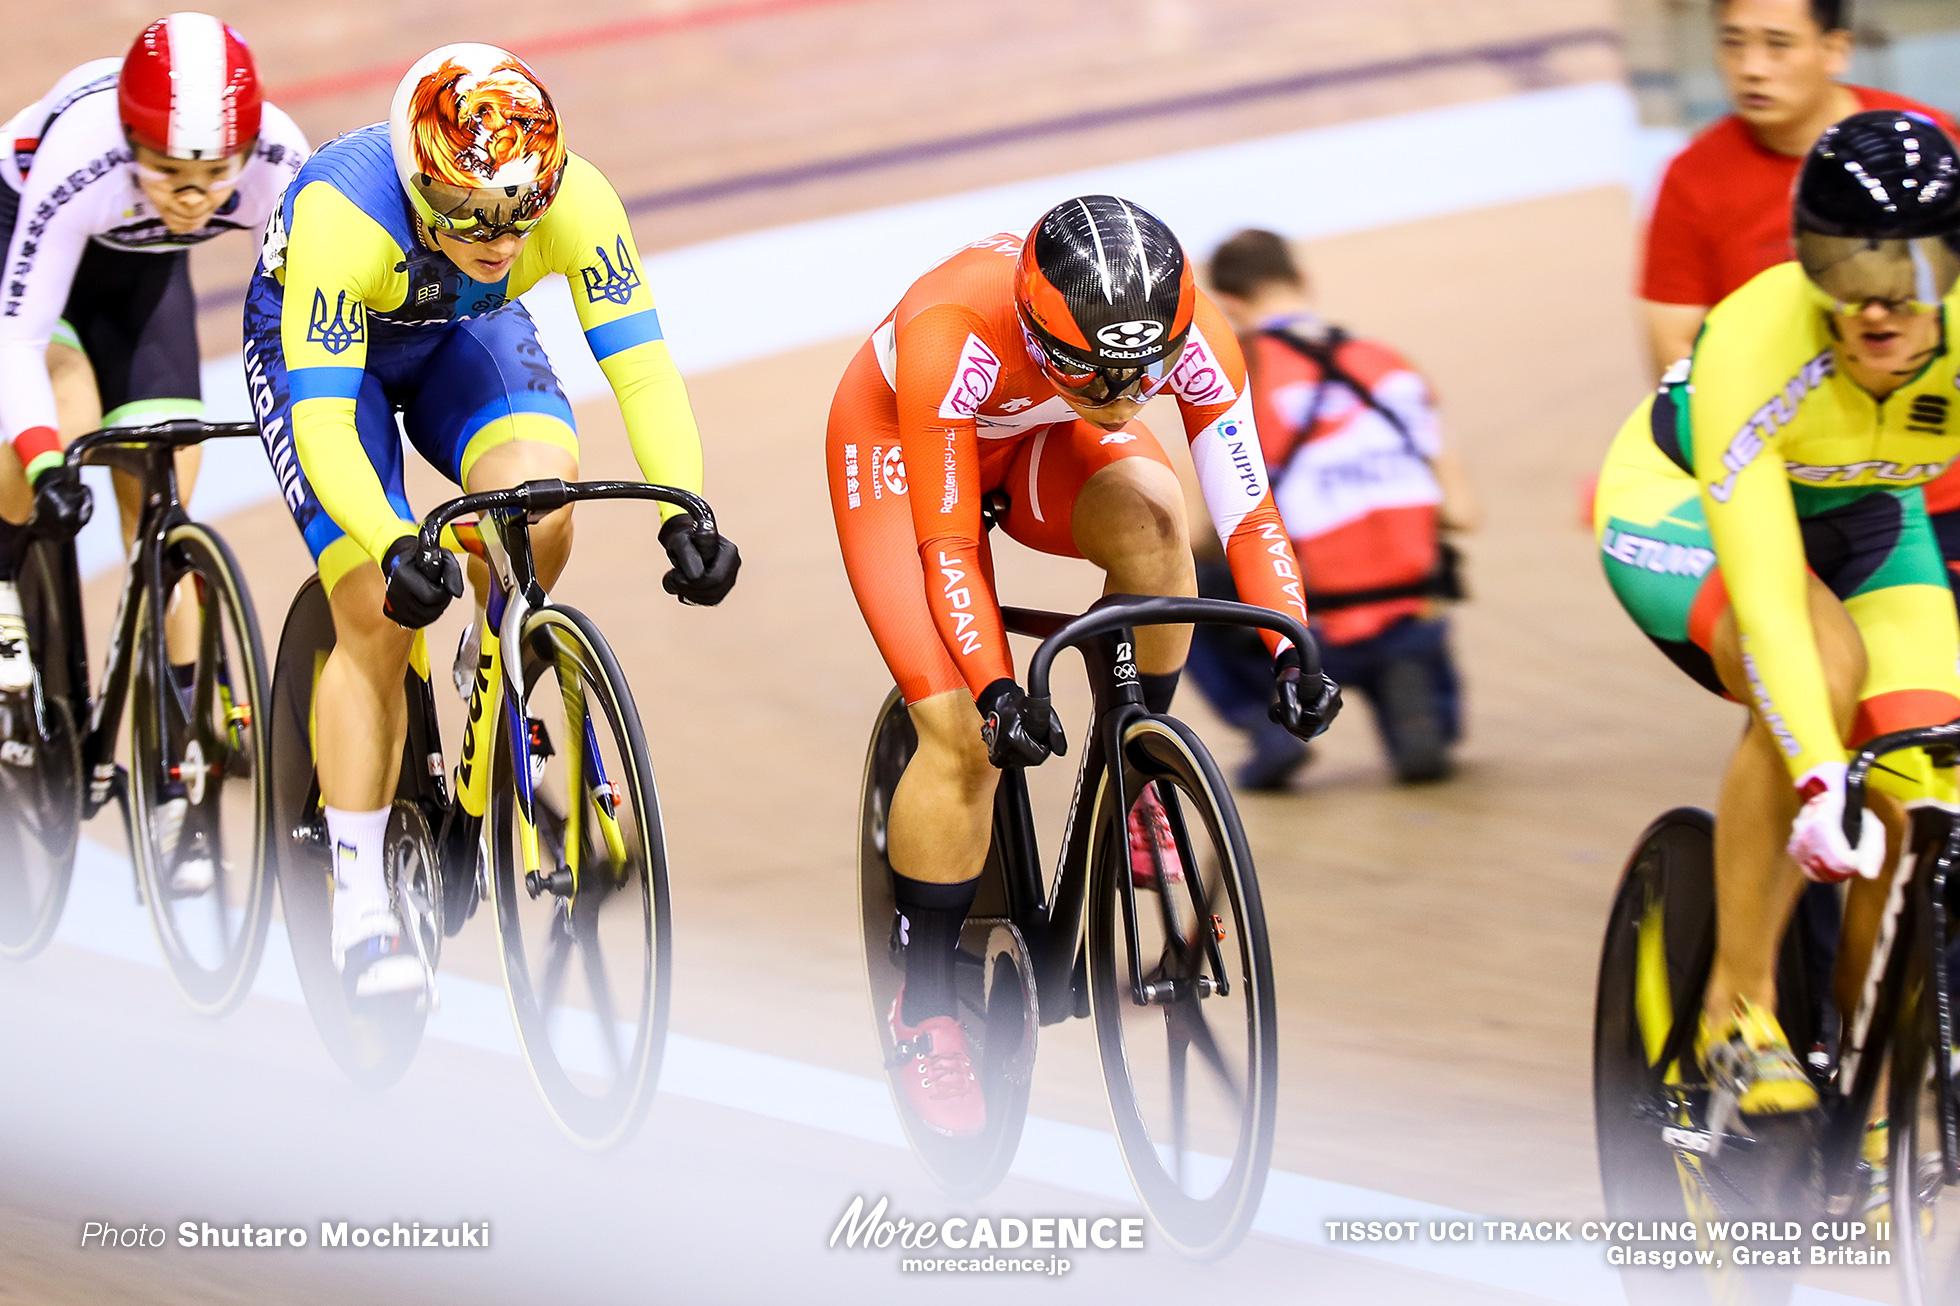 1st Round / Women's Keirin / TISSOT UCI TRACK CYCLING WORLD CUP II, Glasgow, Great Britain, Caitlin WARD ケイトリン・ワード Simona KRUPECKAITE シモーナ・クルペツカイテ Liubov BASOVA リウボヴ・バソワ Helena CASAS ROIGE エレナ・カサス・ロイエ GUO Yufang 太田りゆ